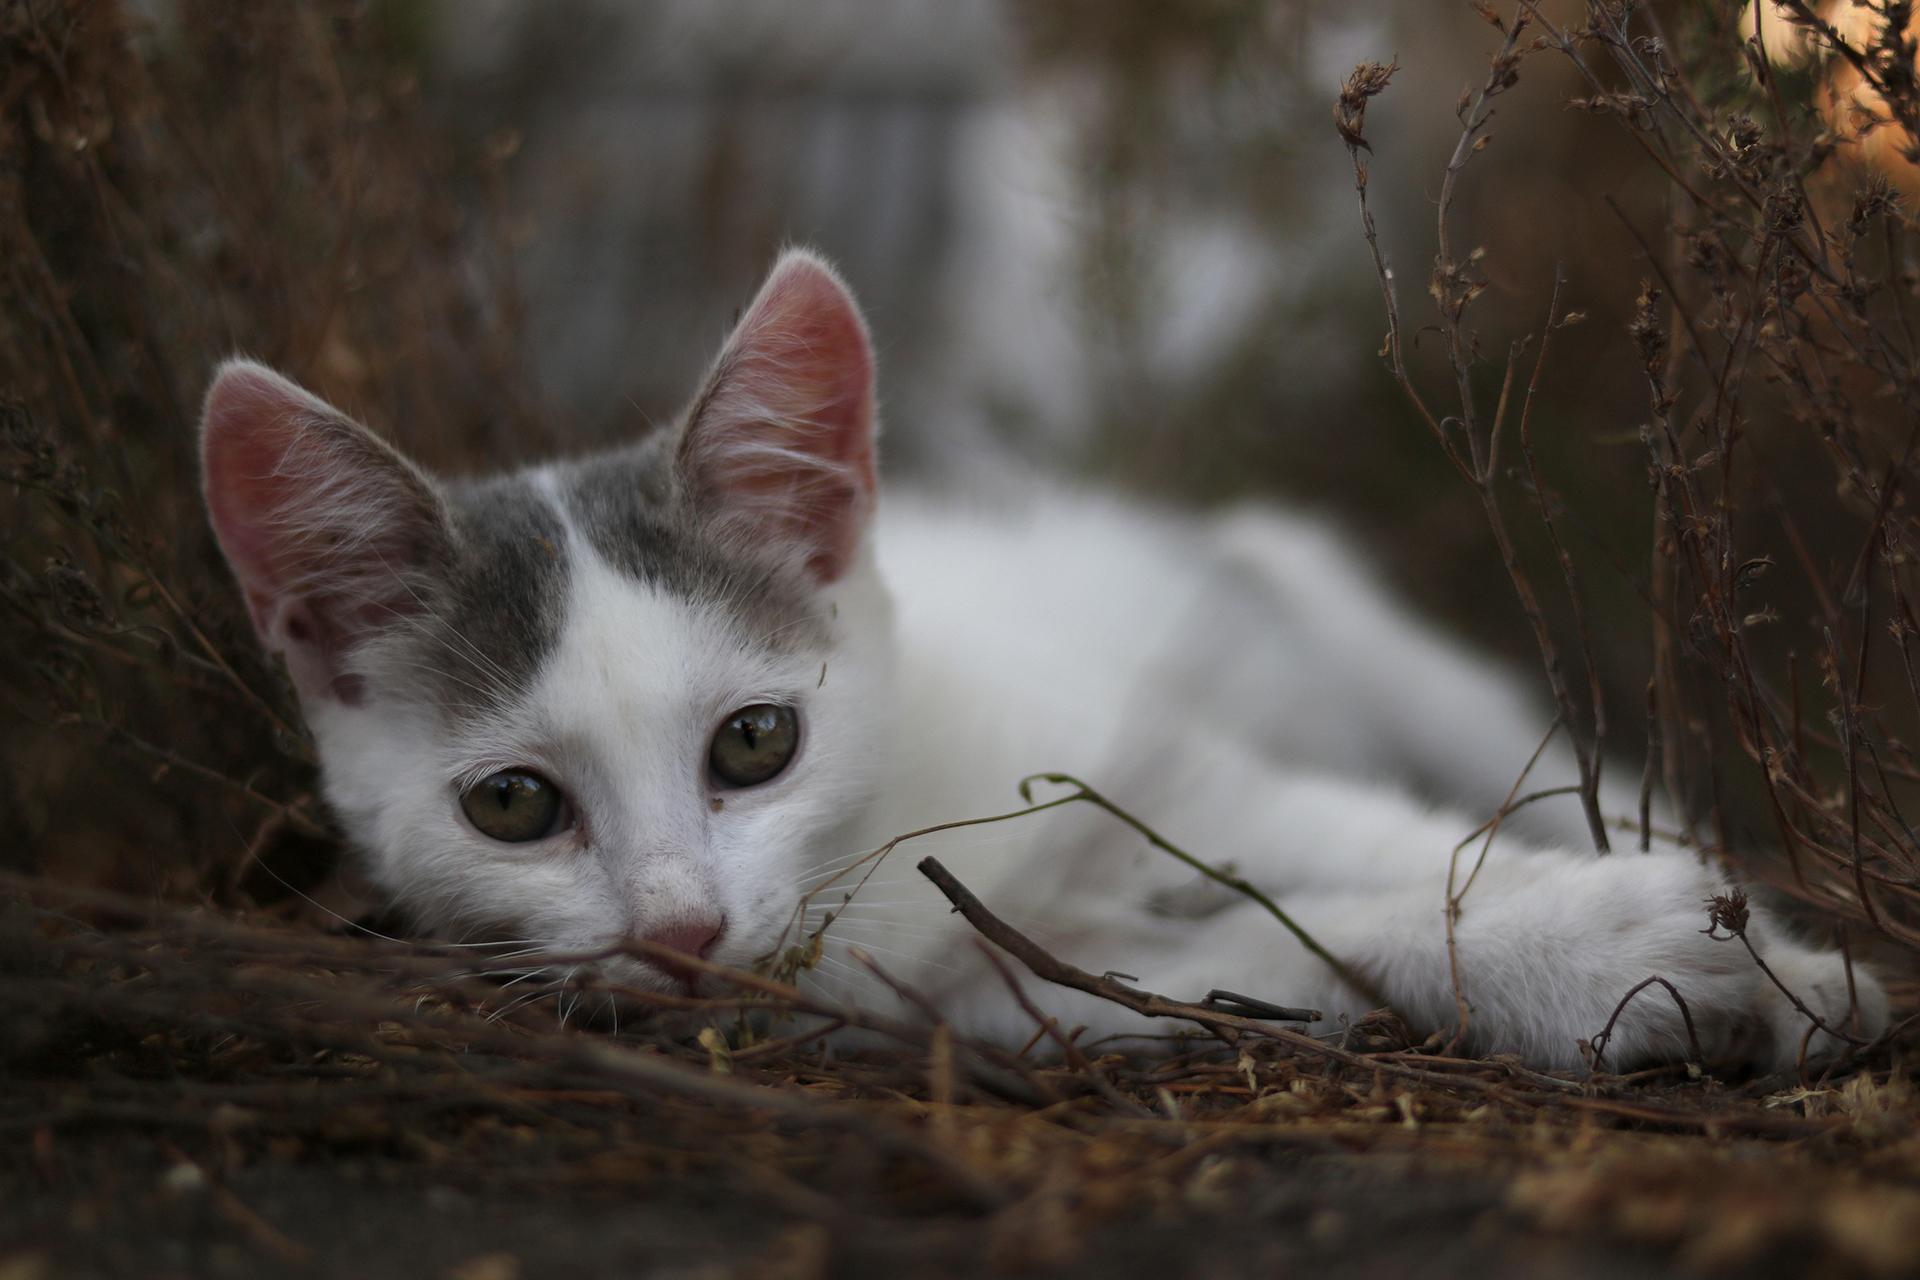 Photo in Pets | Author   - fragranse | PHOTO FORUM